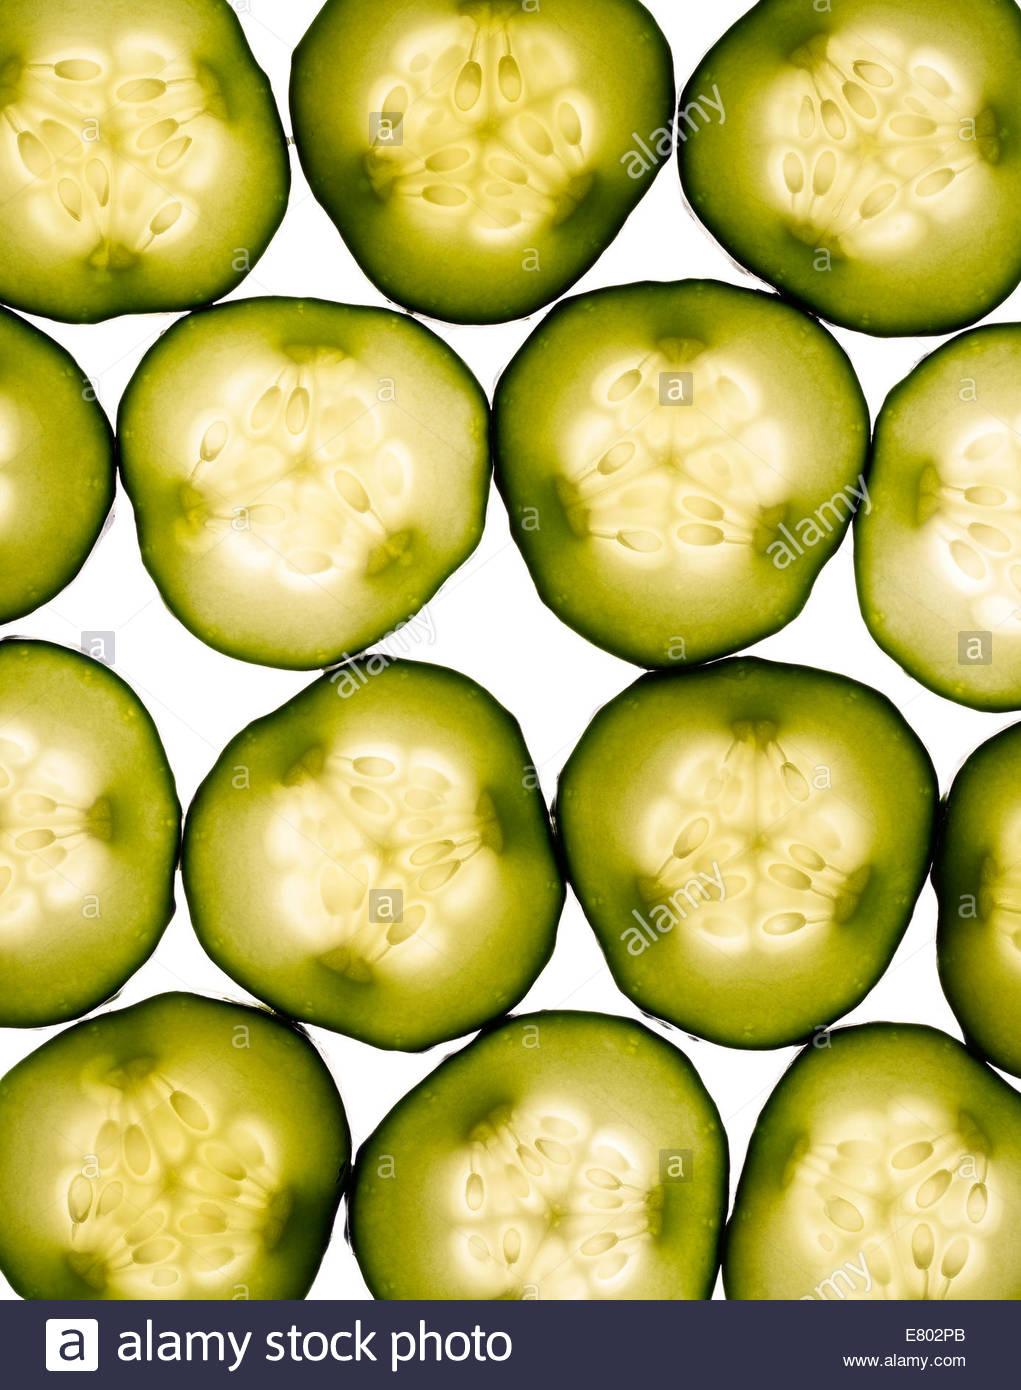 Fresh slices of cucumber on white background - Stock Image